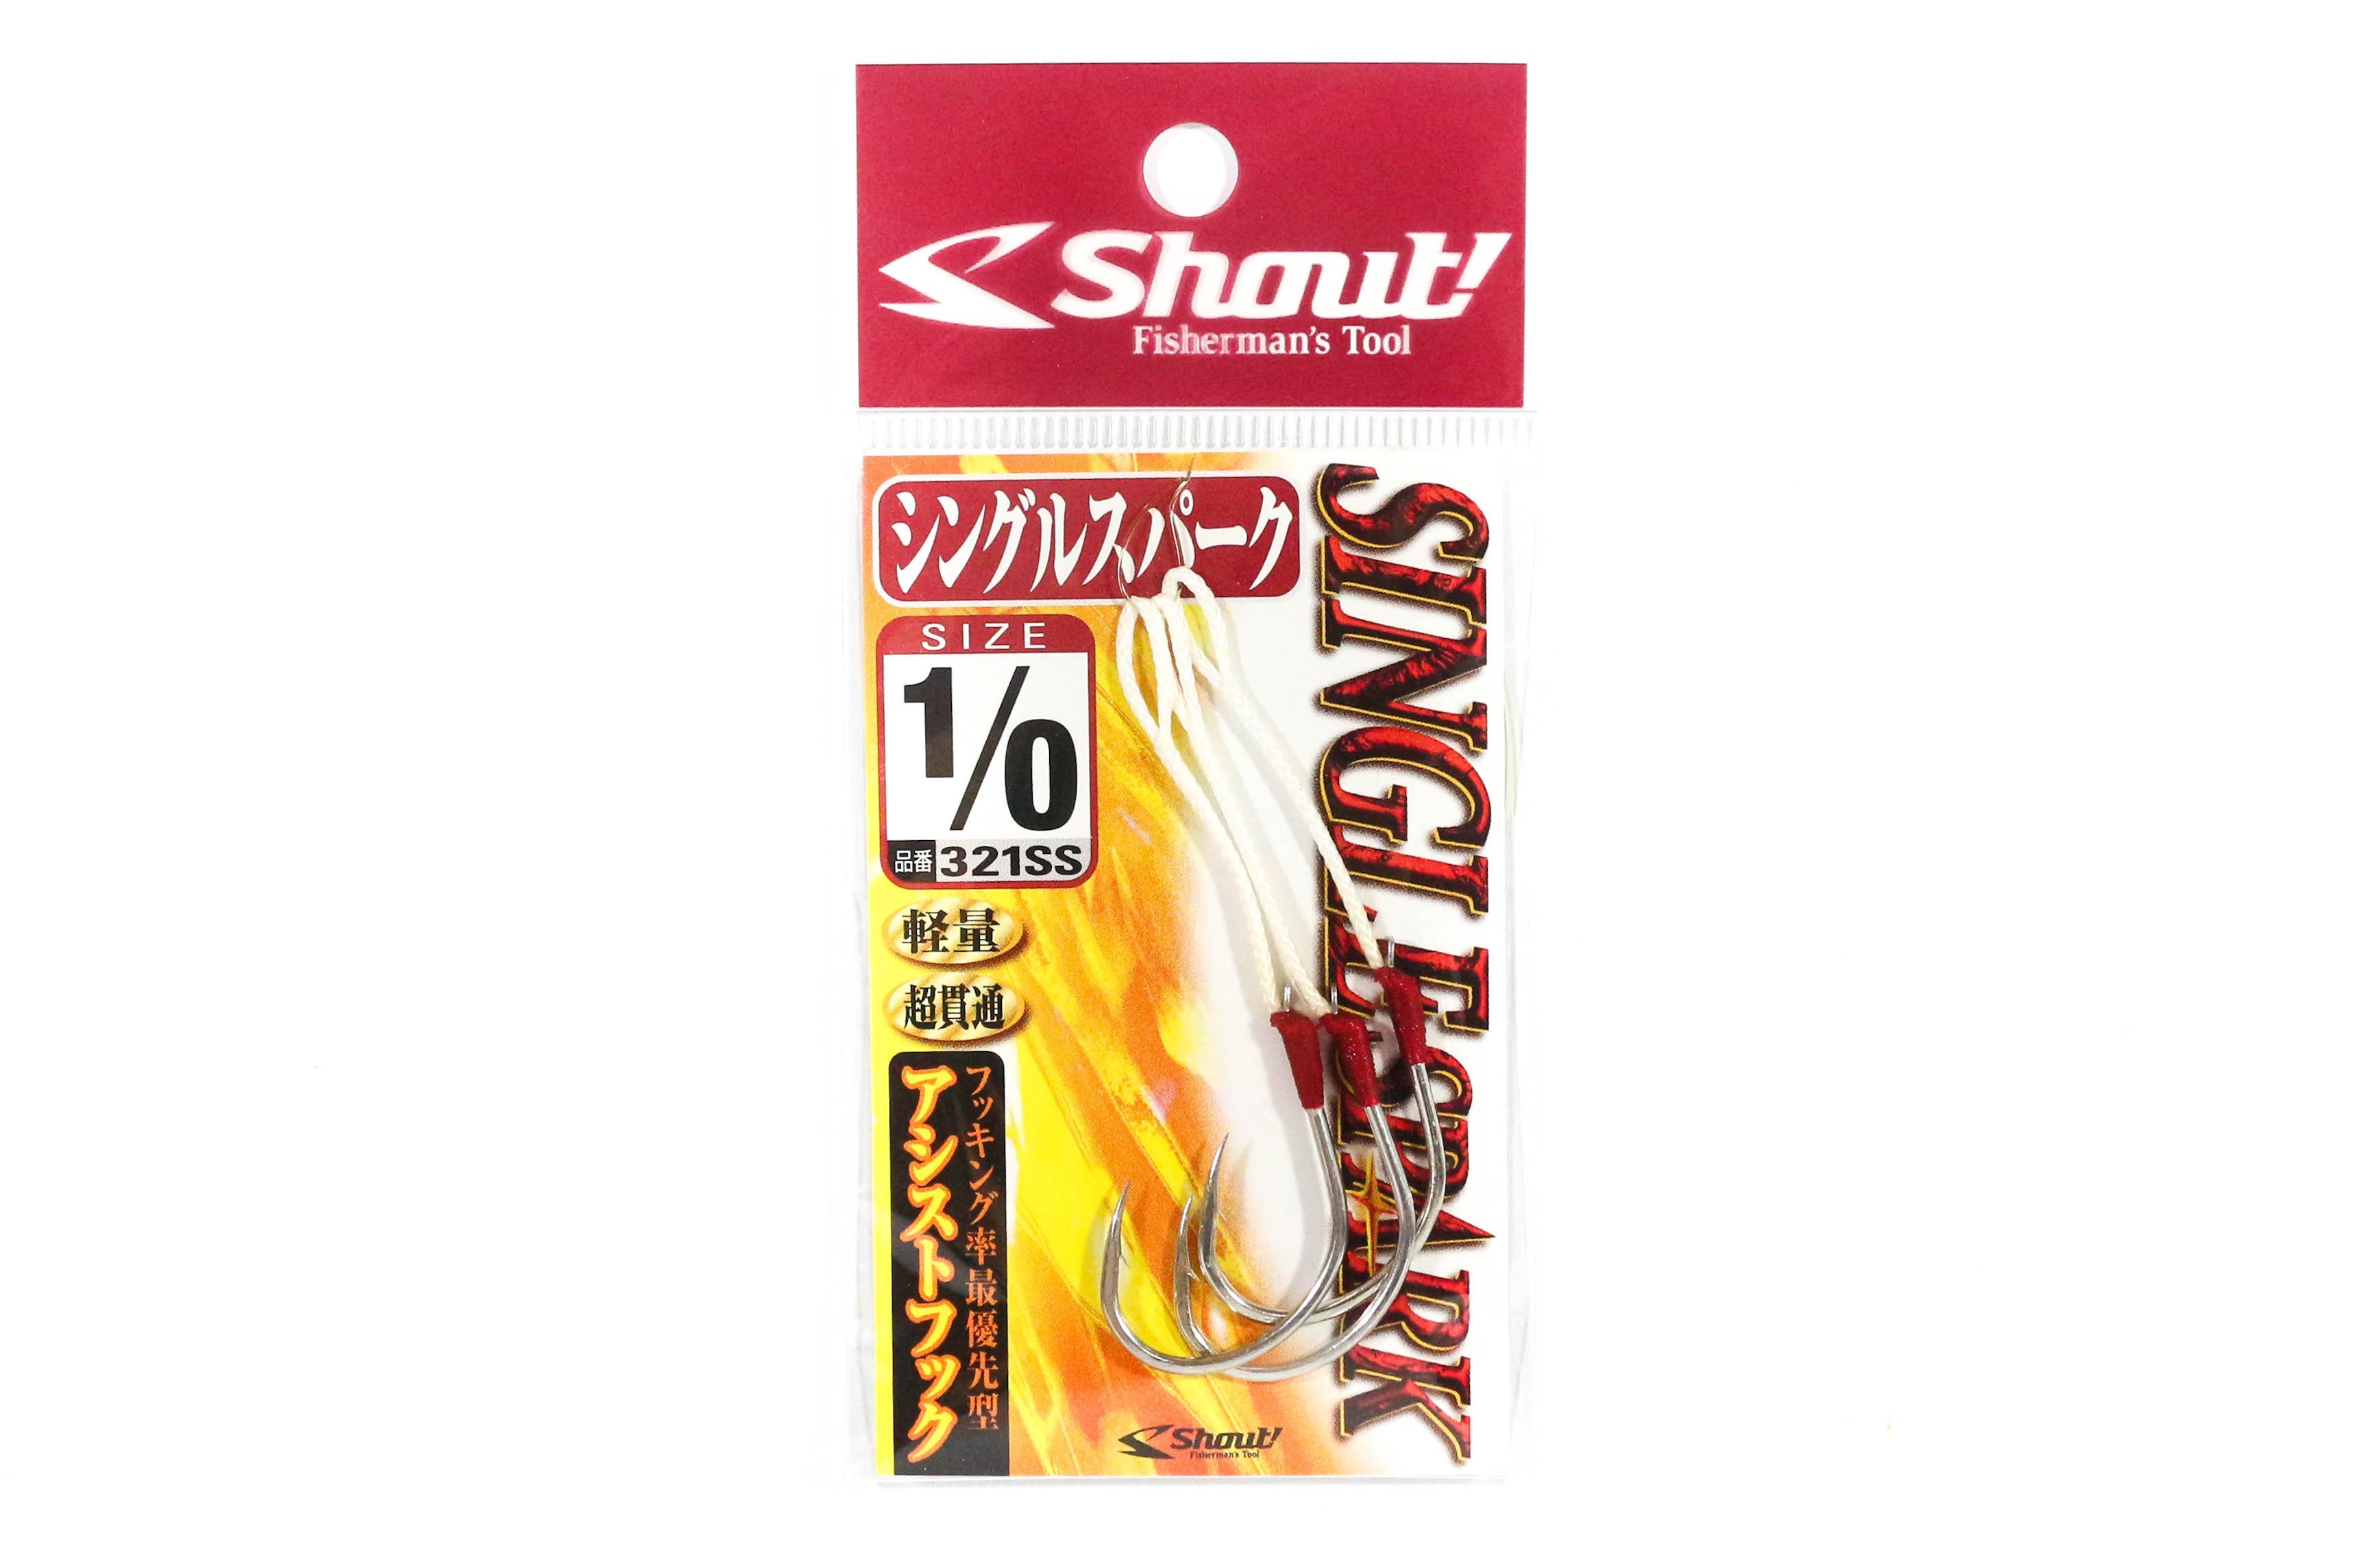 Sale Shout 321-SS Single Spark Rigged Assist Hook Size 1/0 (9501)